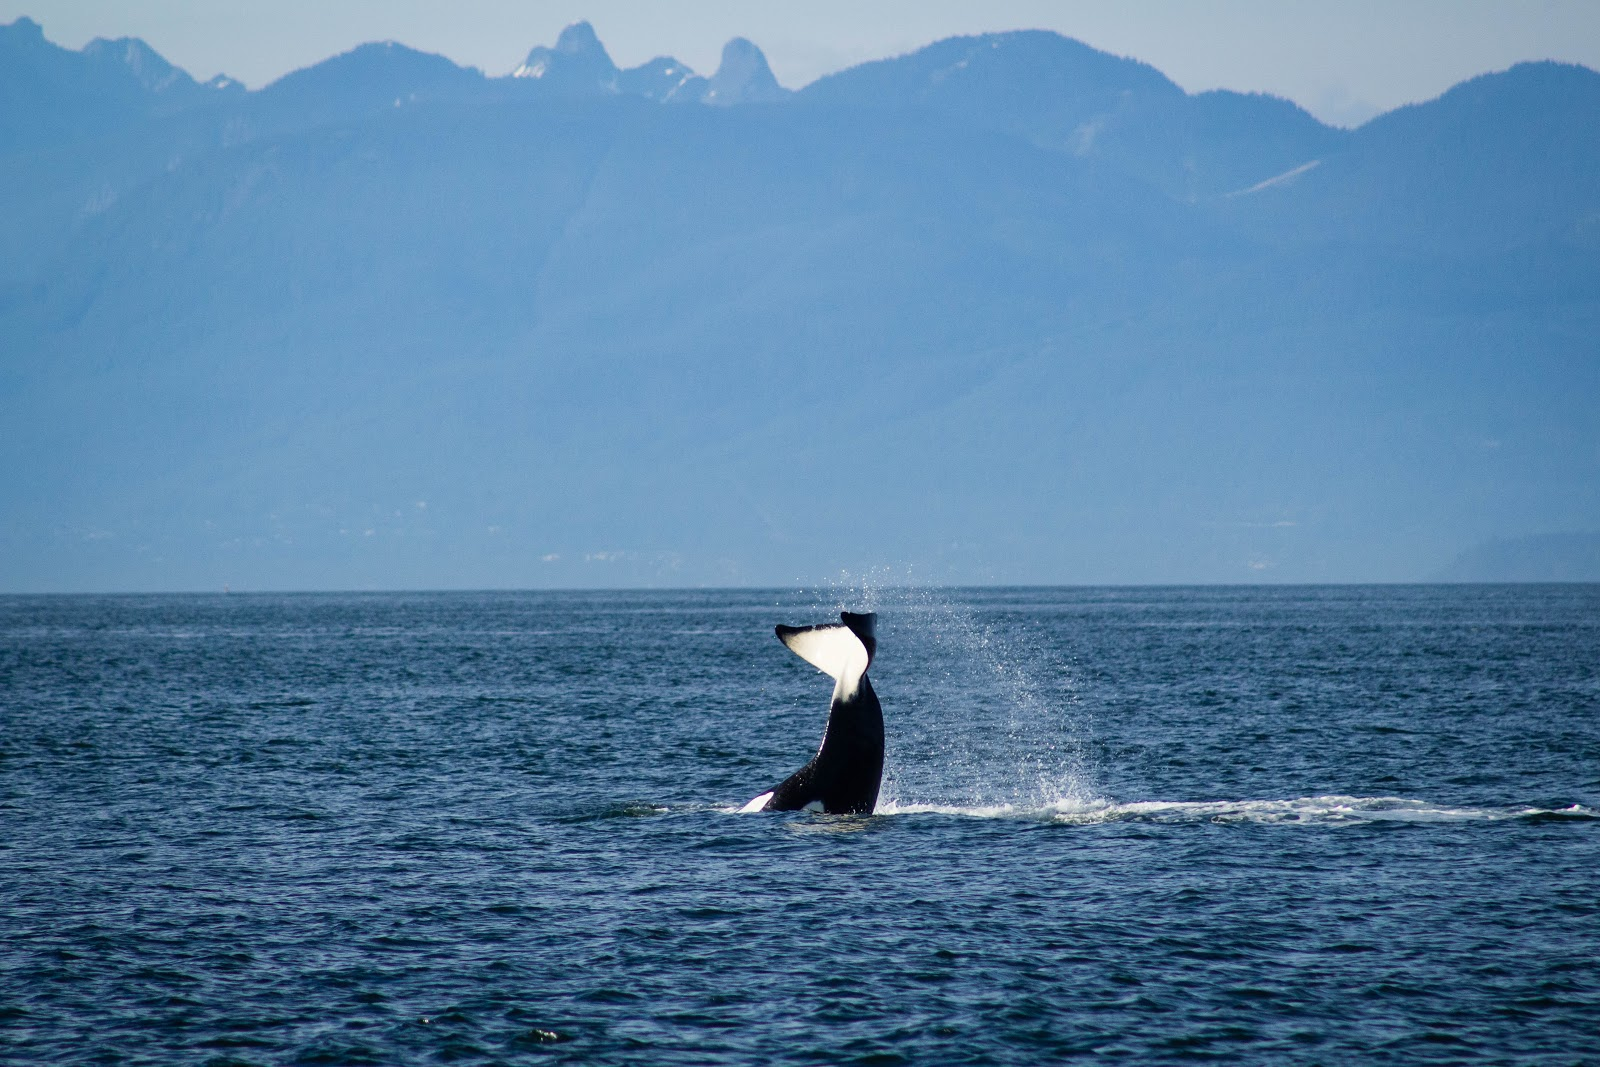 Whale watching at San Juan Island